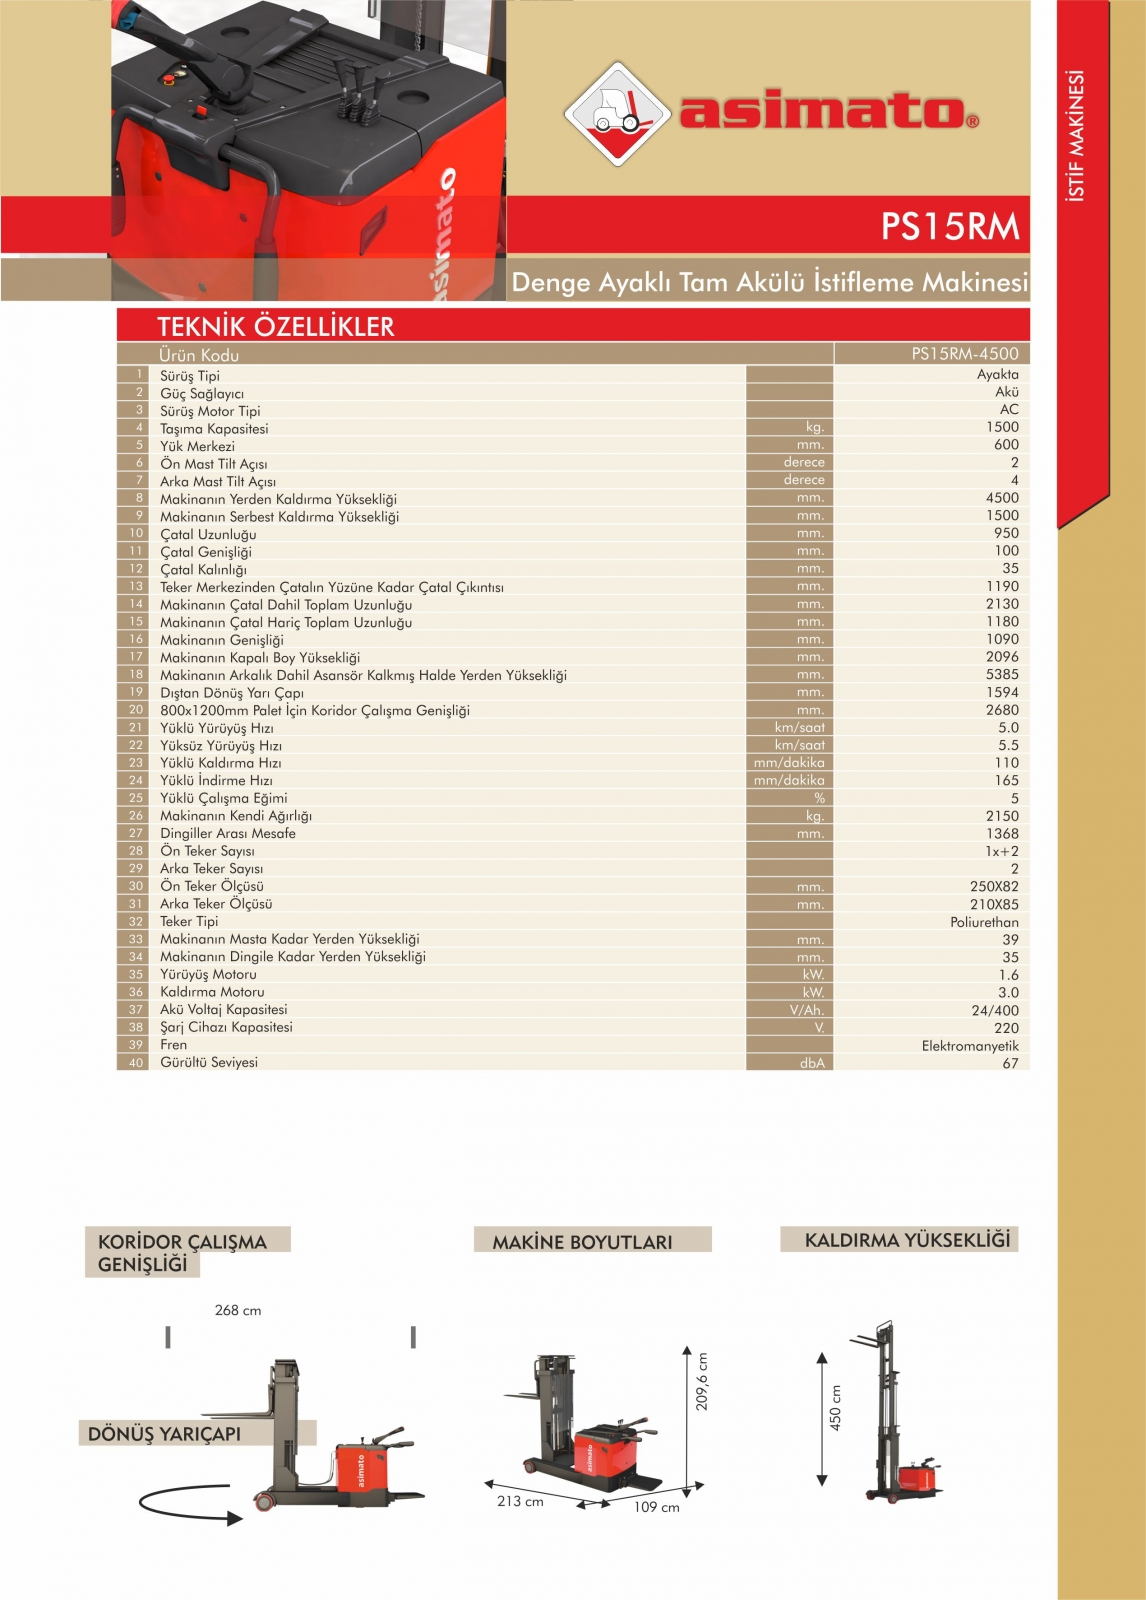 PS15RM SERİSİ 1.5 TON 4.5 METRE TAM AKÜLÜ İSTİF MAKİNESİ